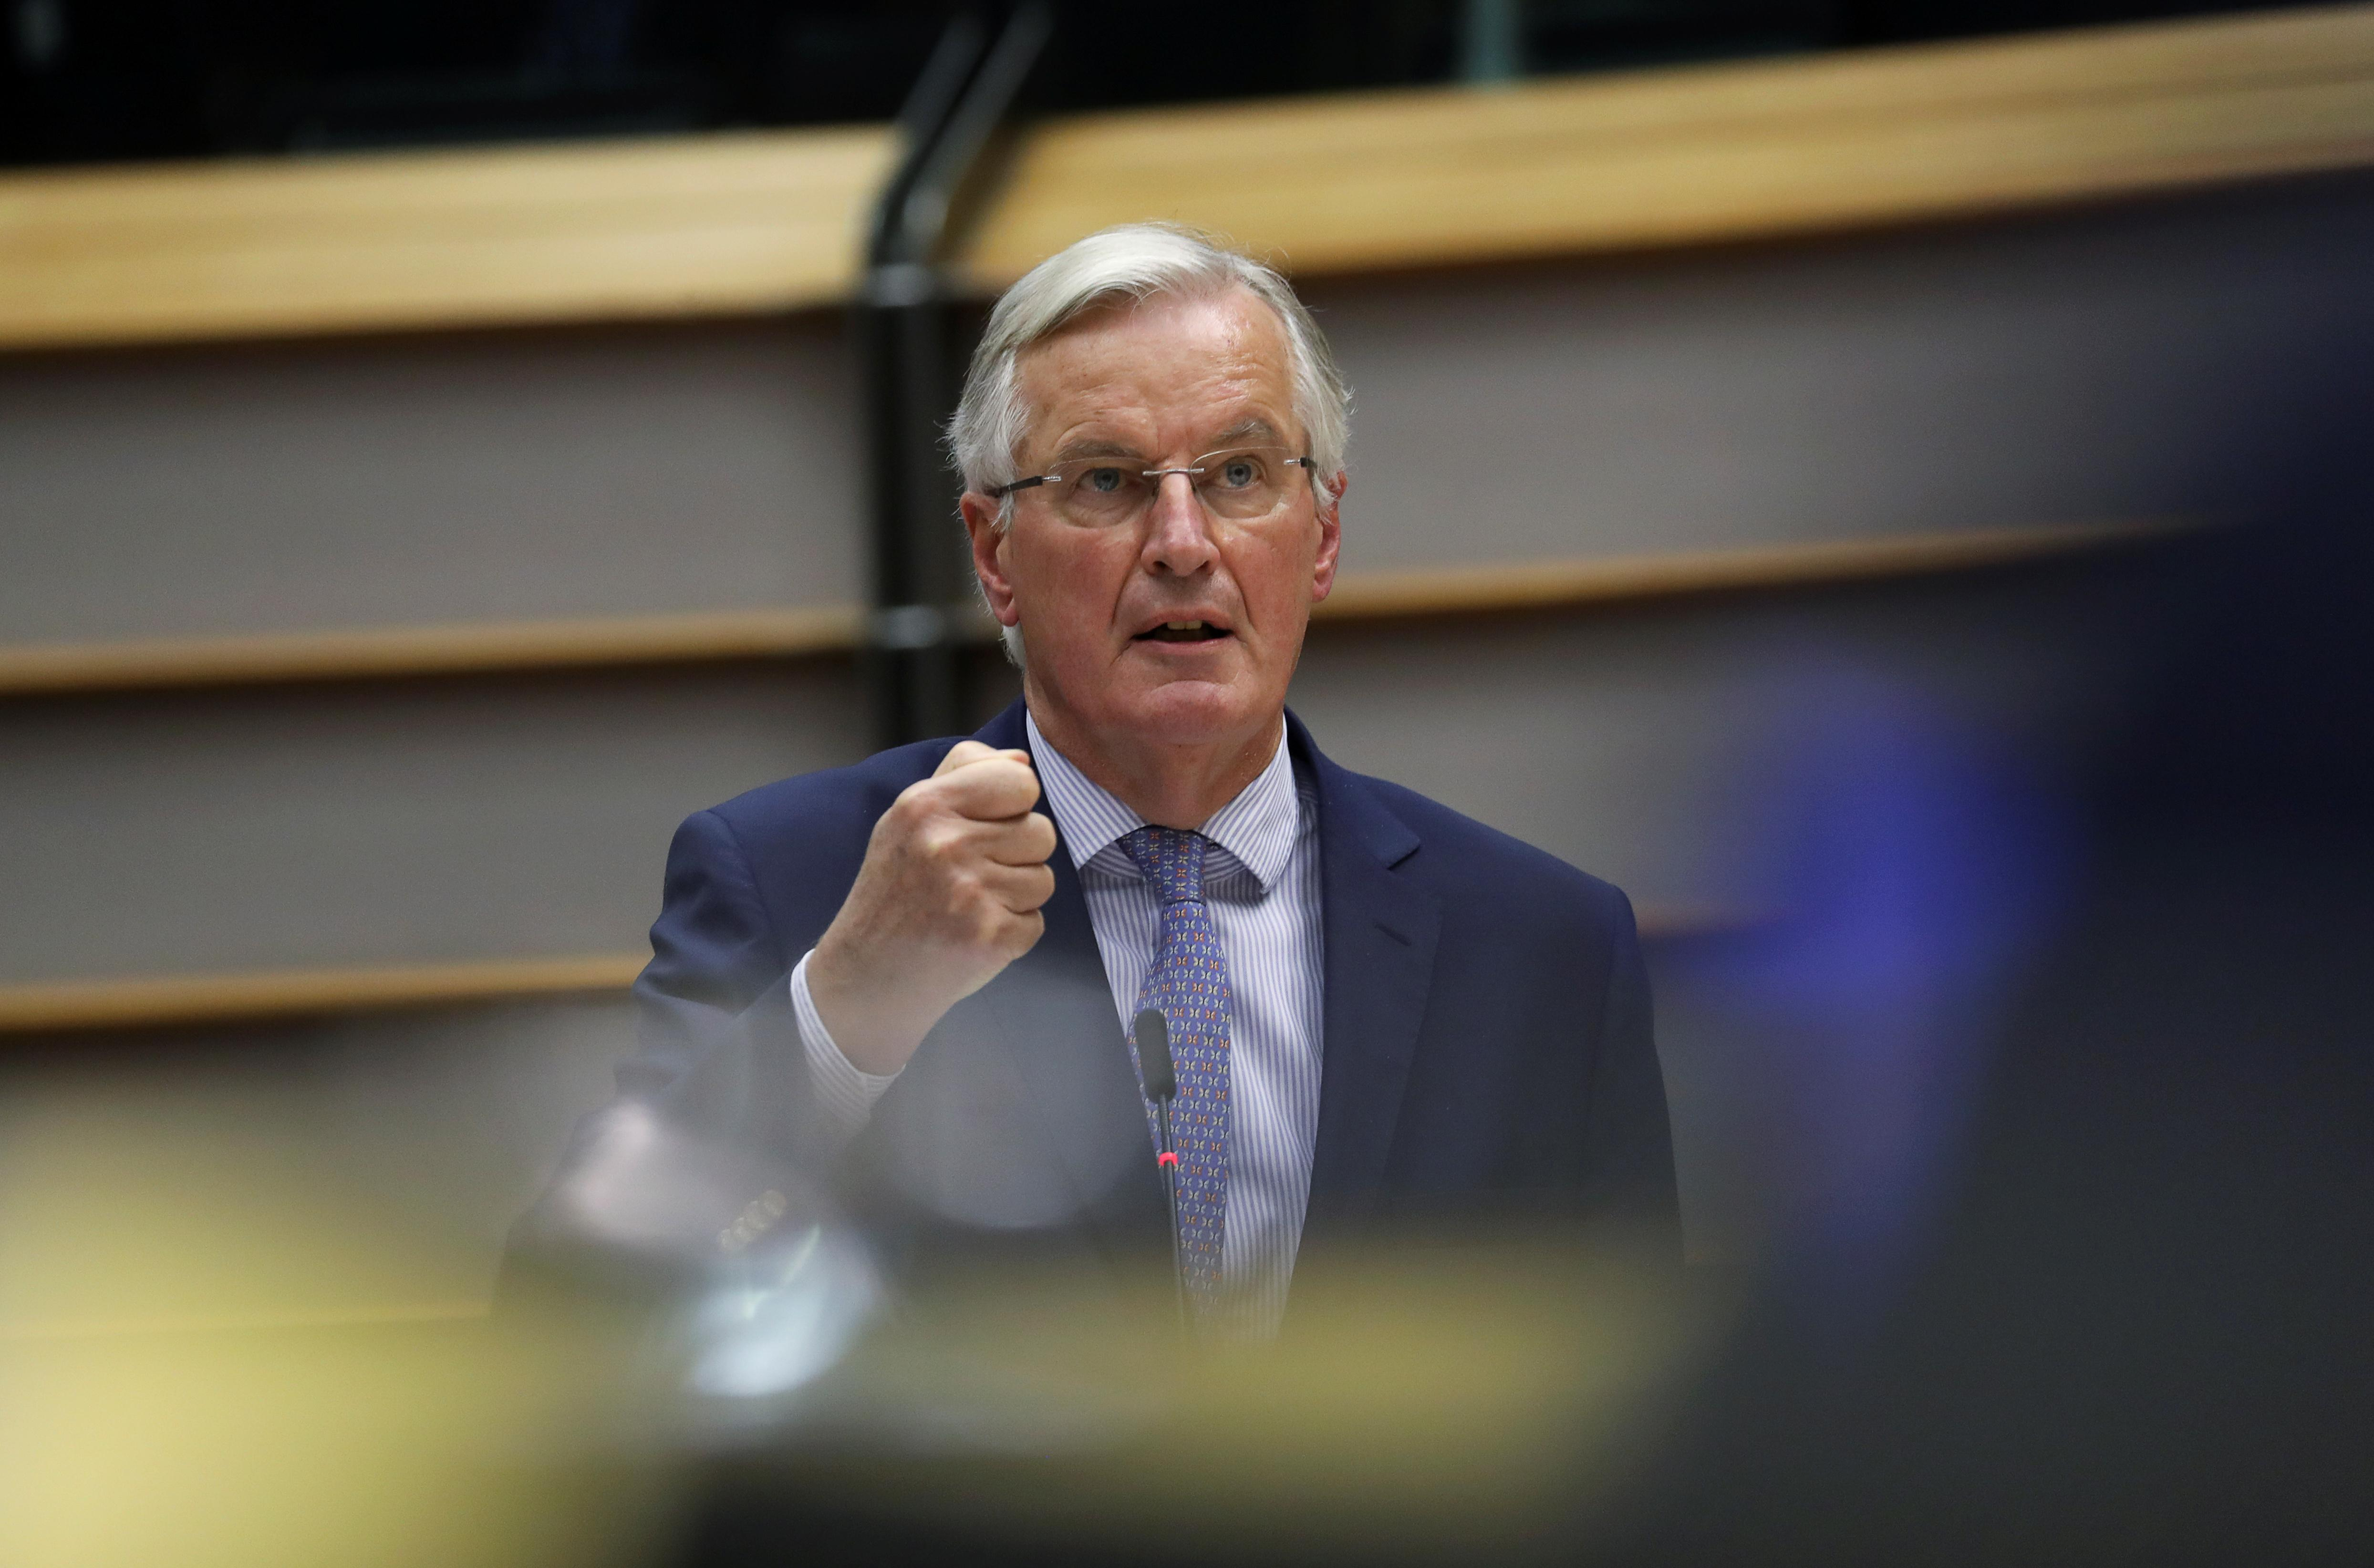 EU tells Britain: Make more concessions if you want a Brexit deal